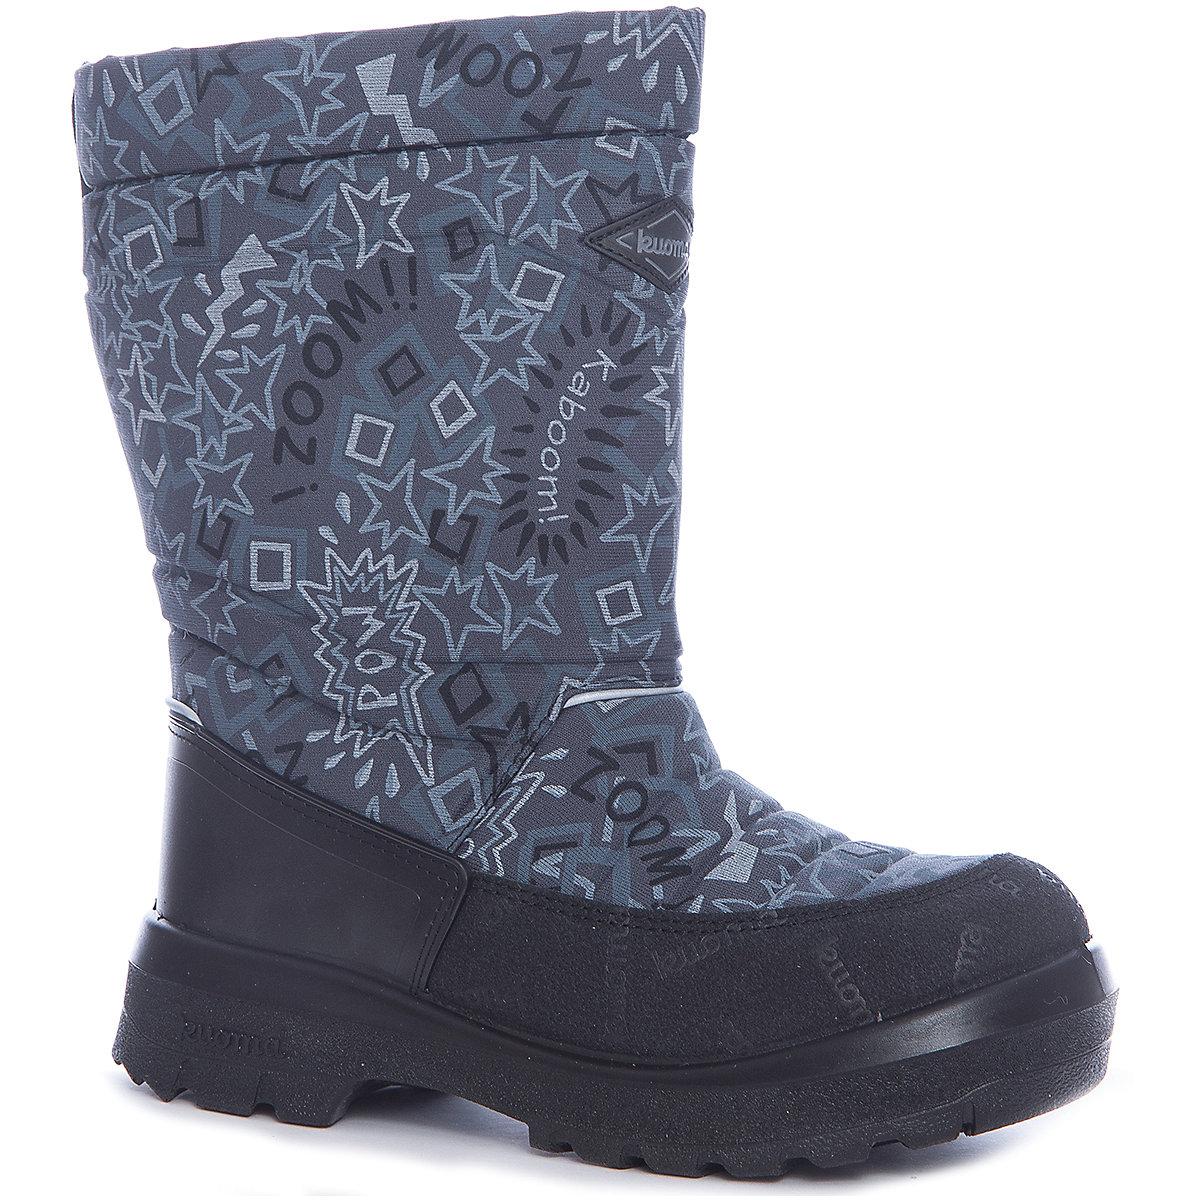 Boots KUOMA for boys 7047442 Valenki Uggi Winter shoes Children Kids MTpromo reima boots 8624989 for boys winter boy children shoes